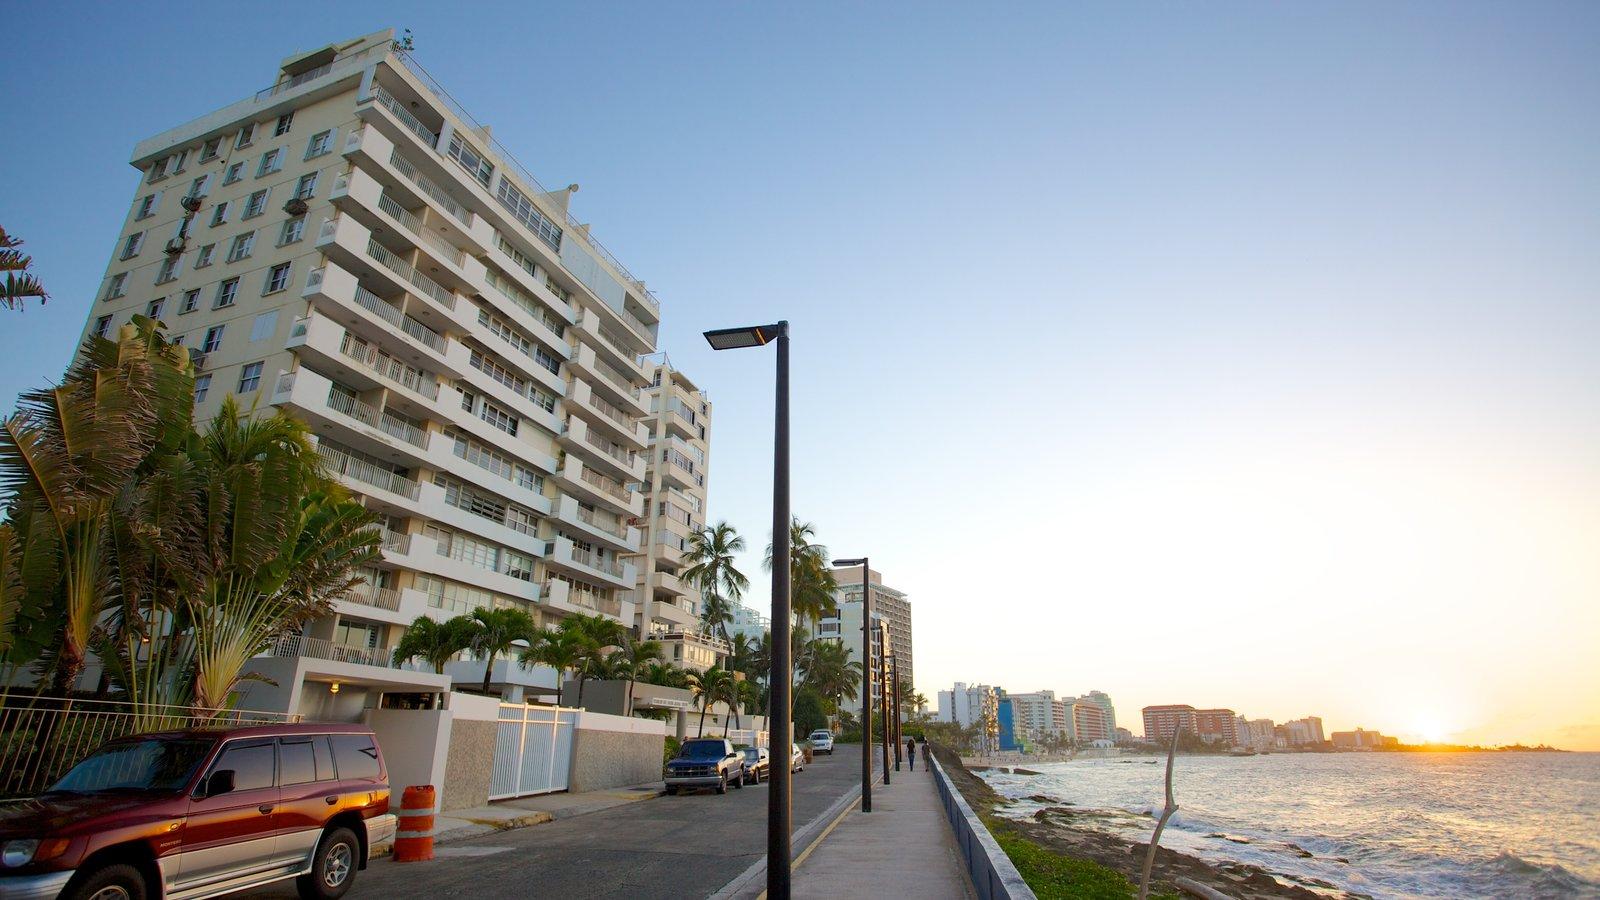 Condado Beach which includes general coastal views, street scenes and a coastal town